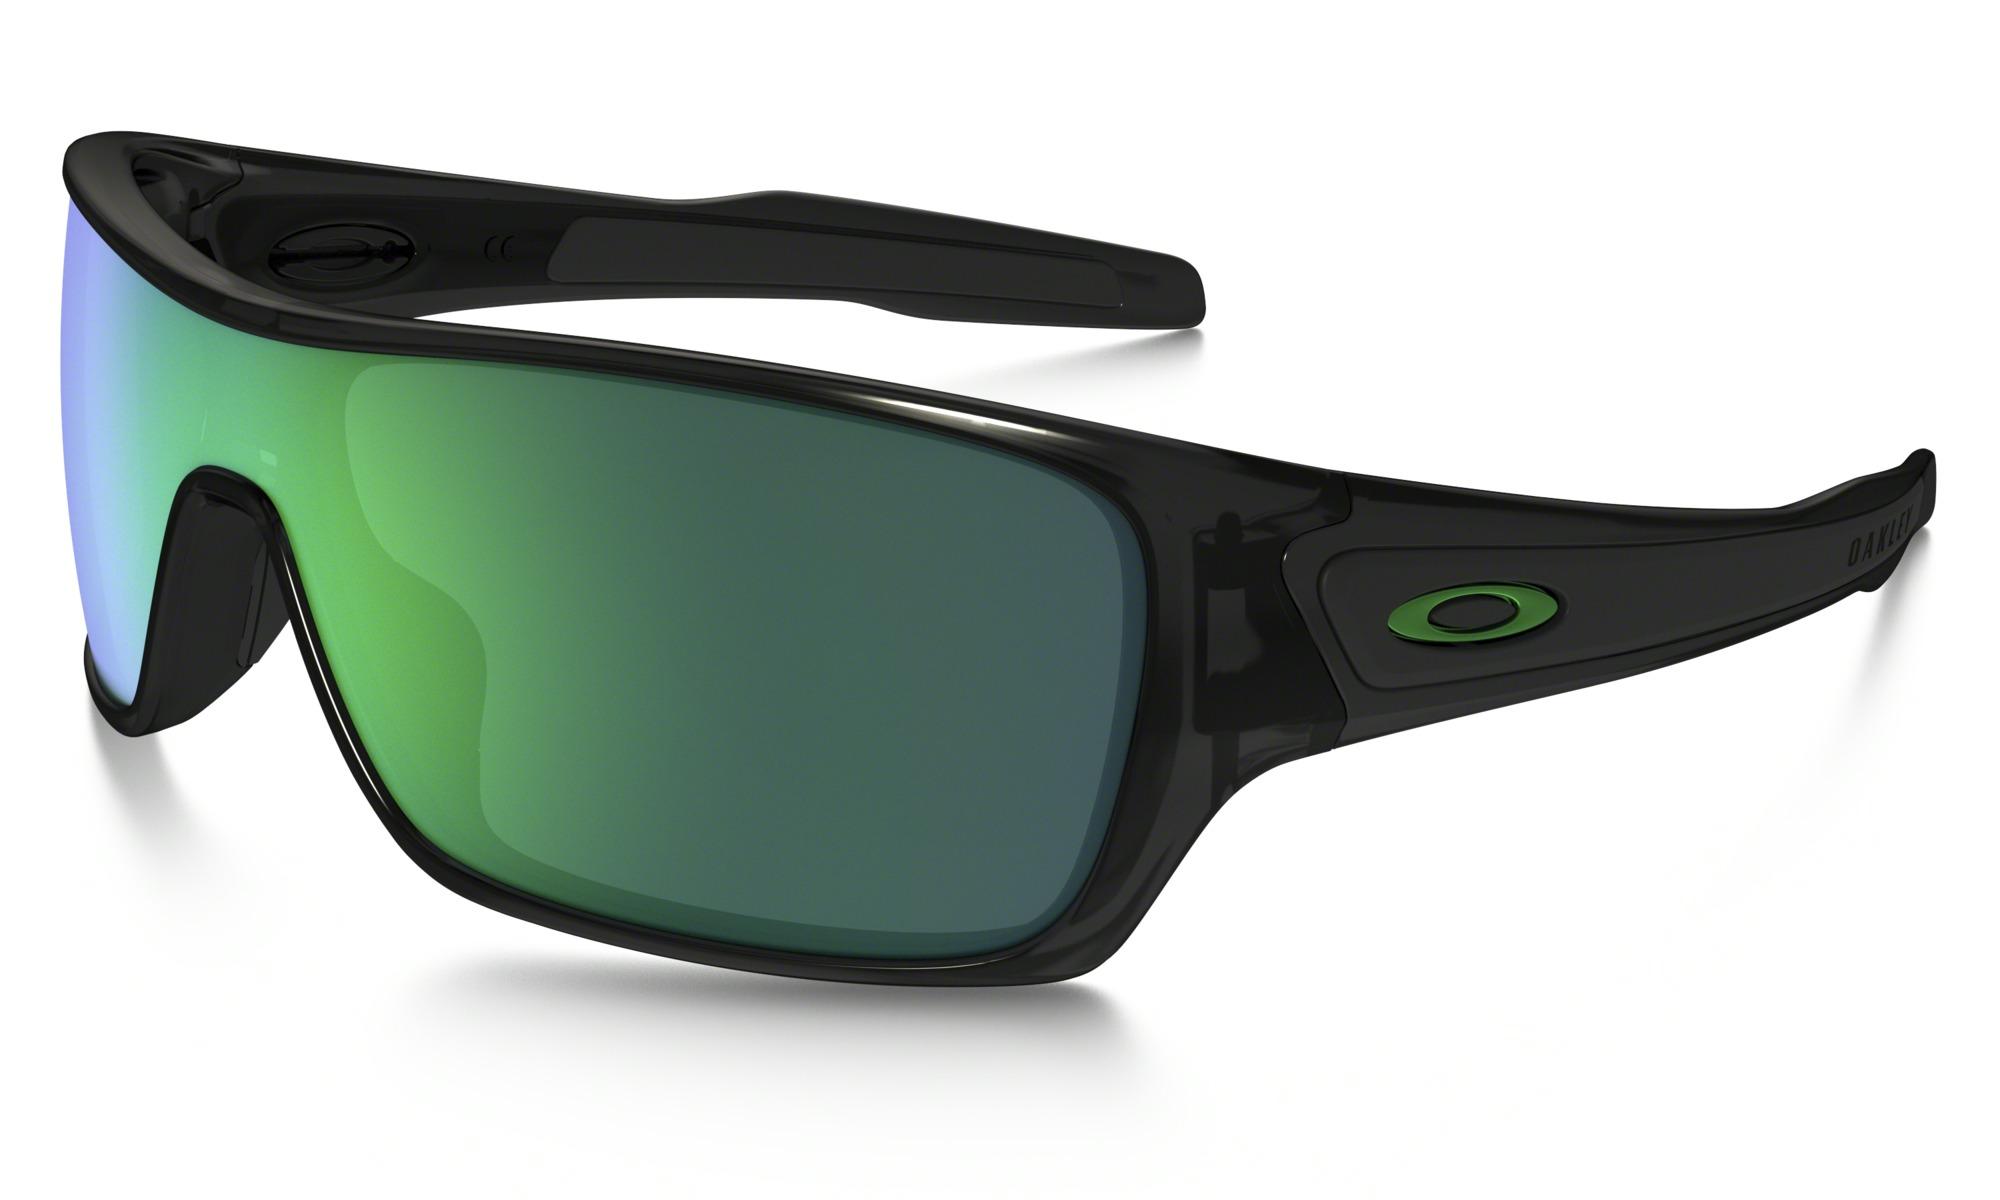 ea0528847c Oakley Turbine Rotor Sunglasses. Full Screen